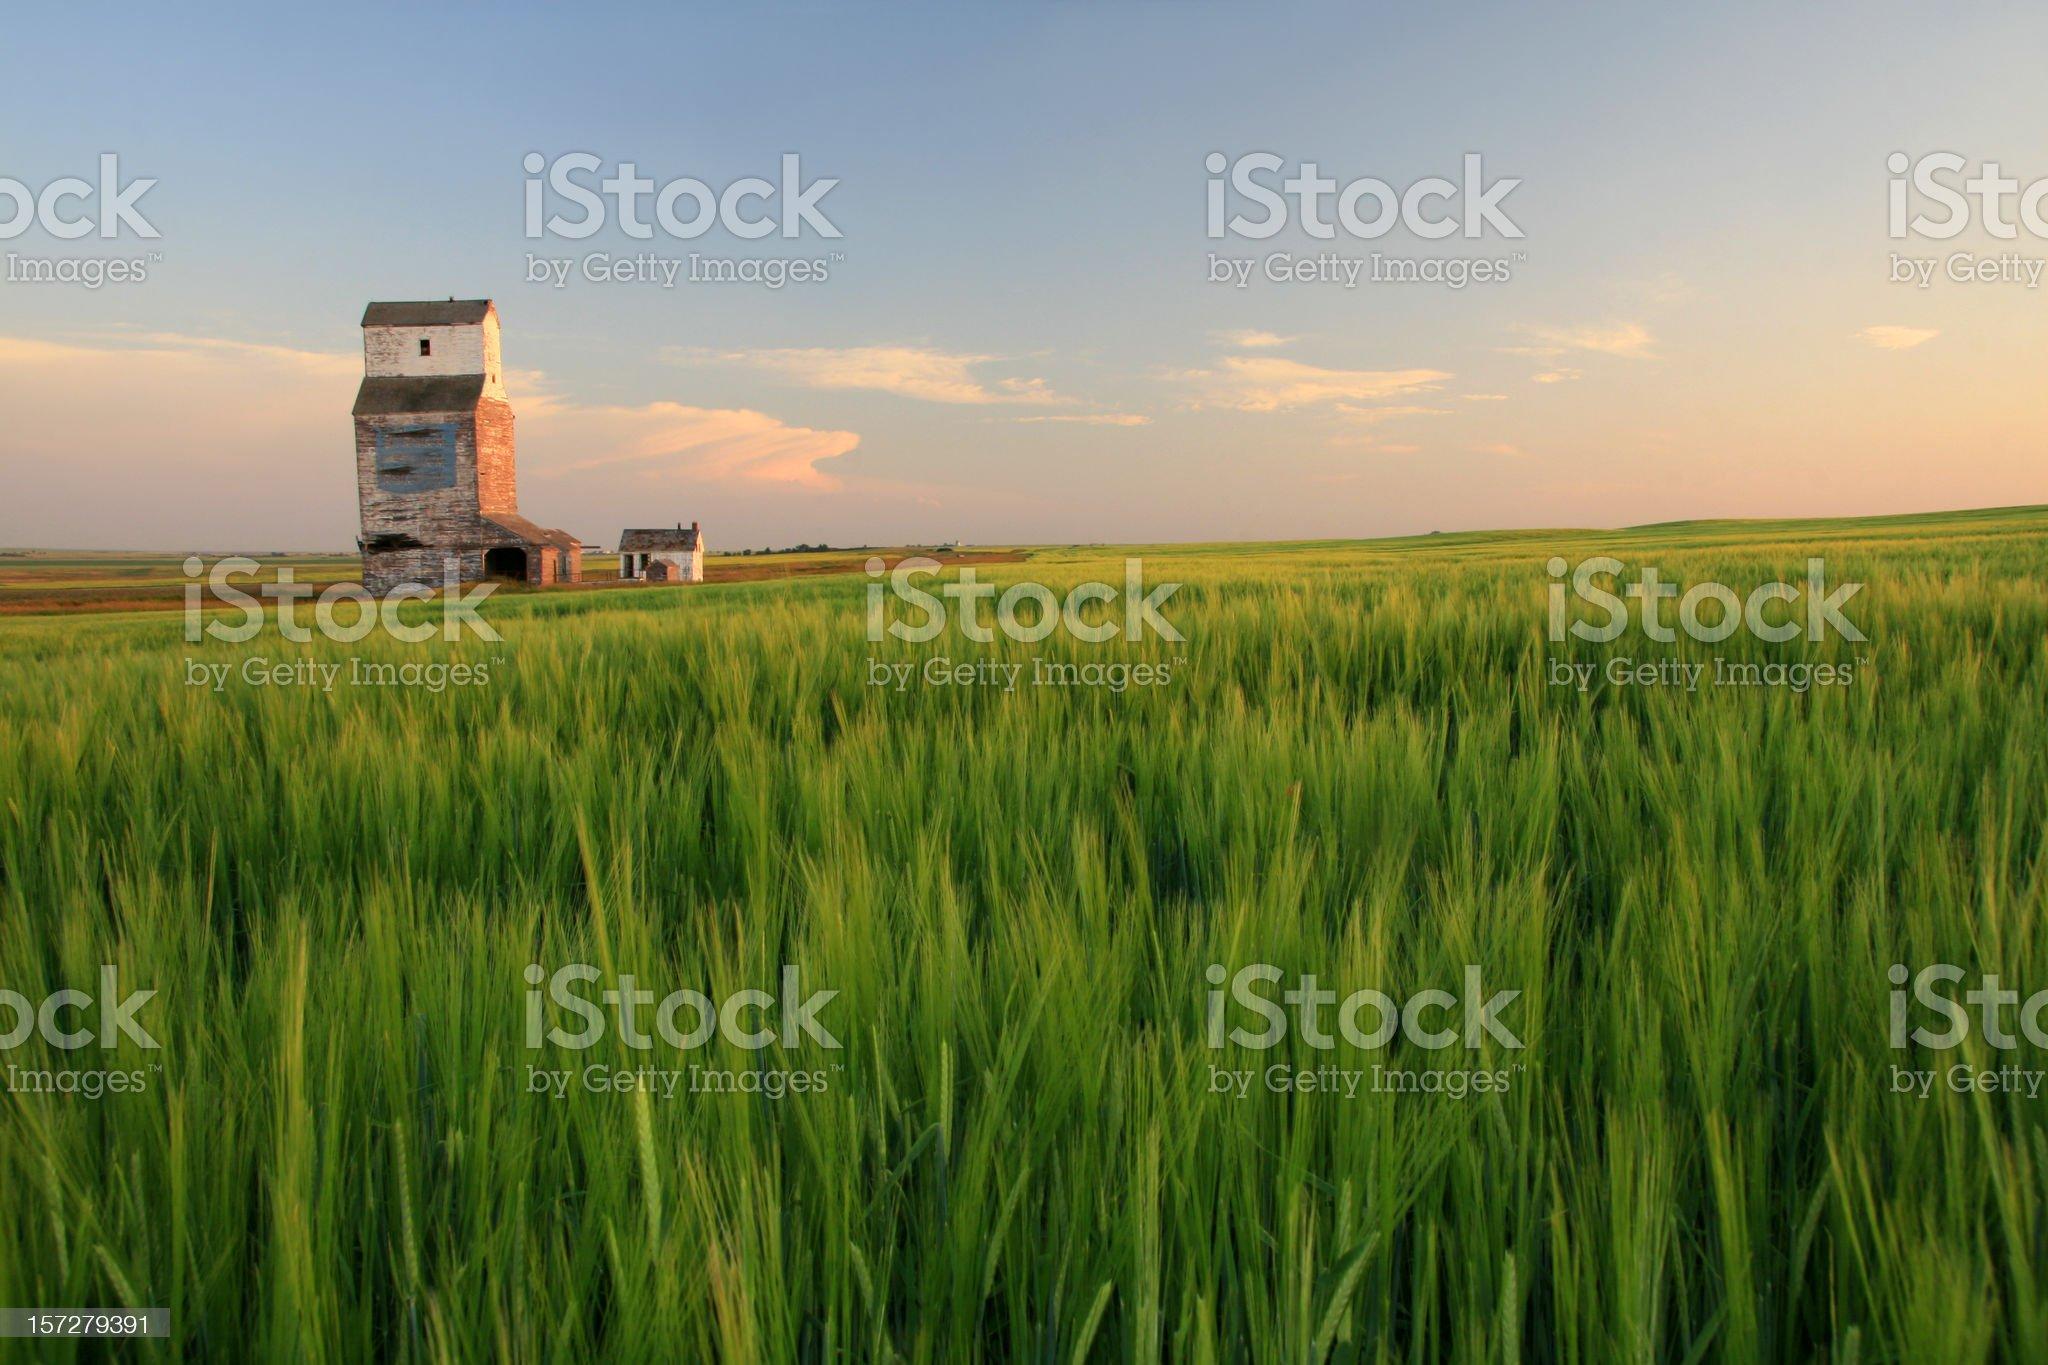 Wooden Grain Elevator on the Prairie royalty-free stock photo